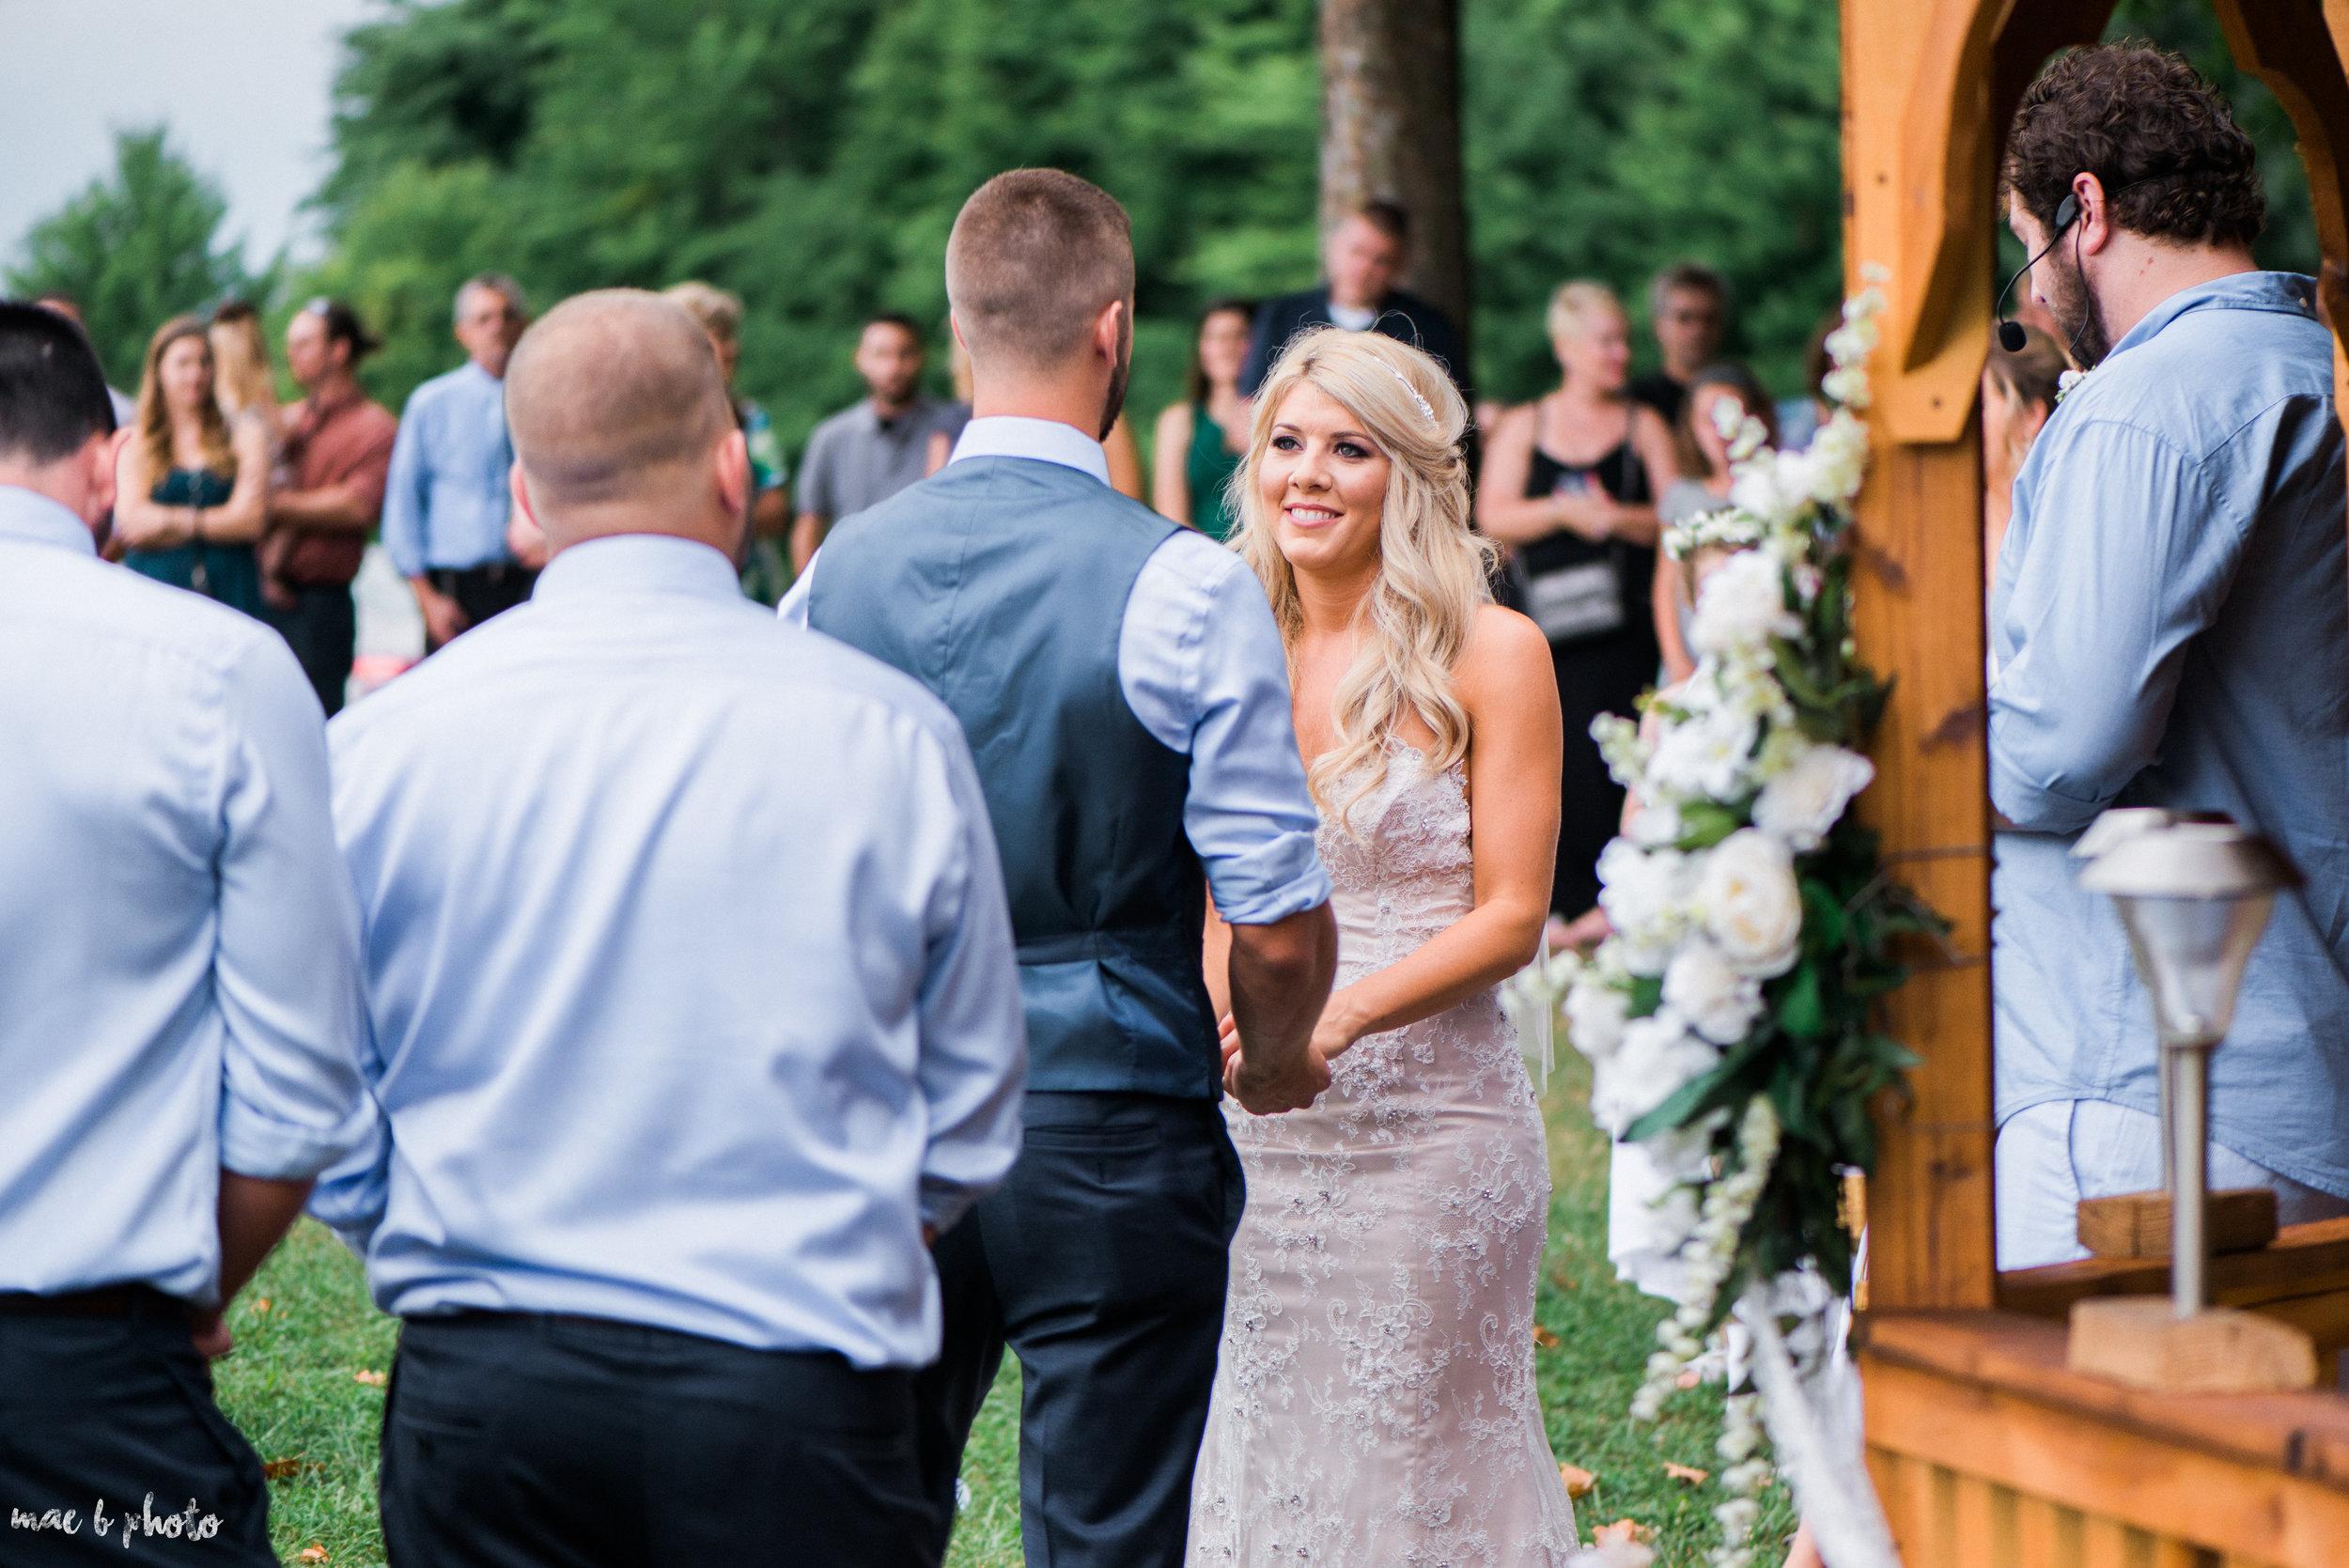 Tara & Matt's Elegant Backyard Summer Wedding in Kinsman, Ohio-42.jpg